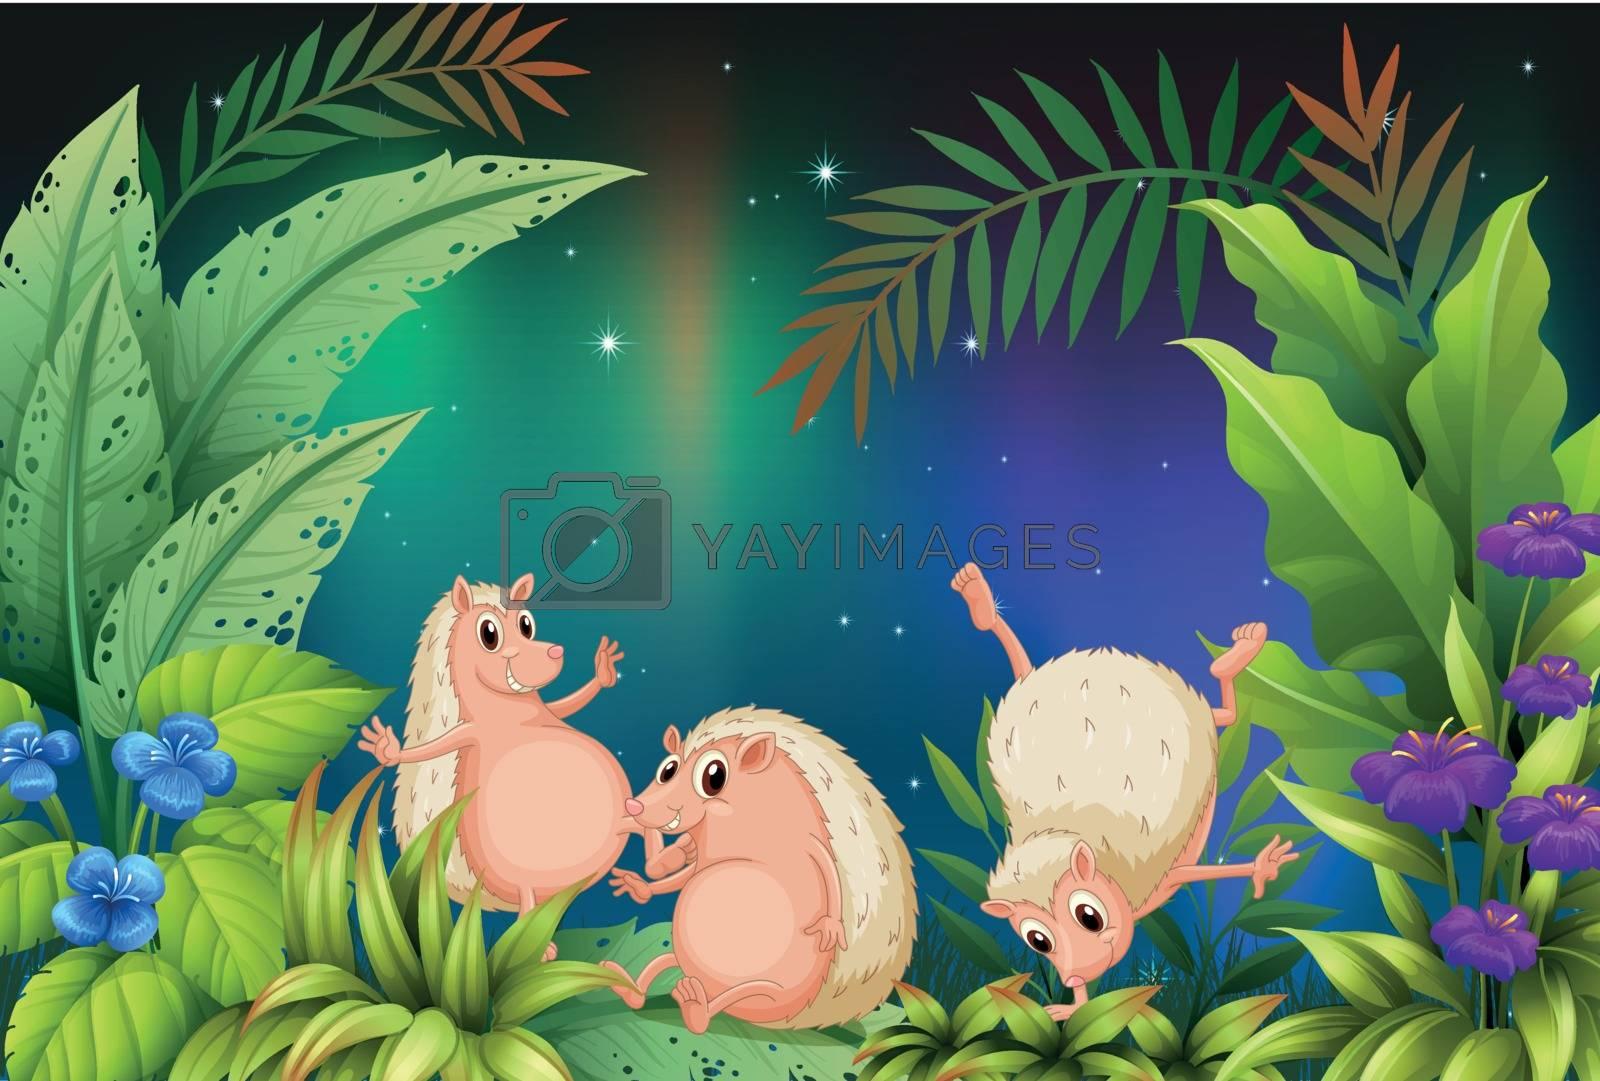 Illustration of three wild animals playing in the garden